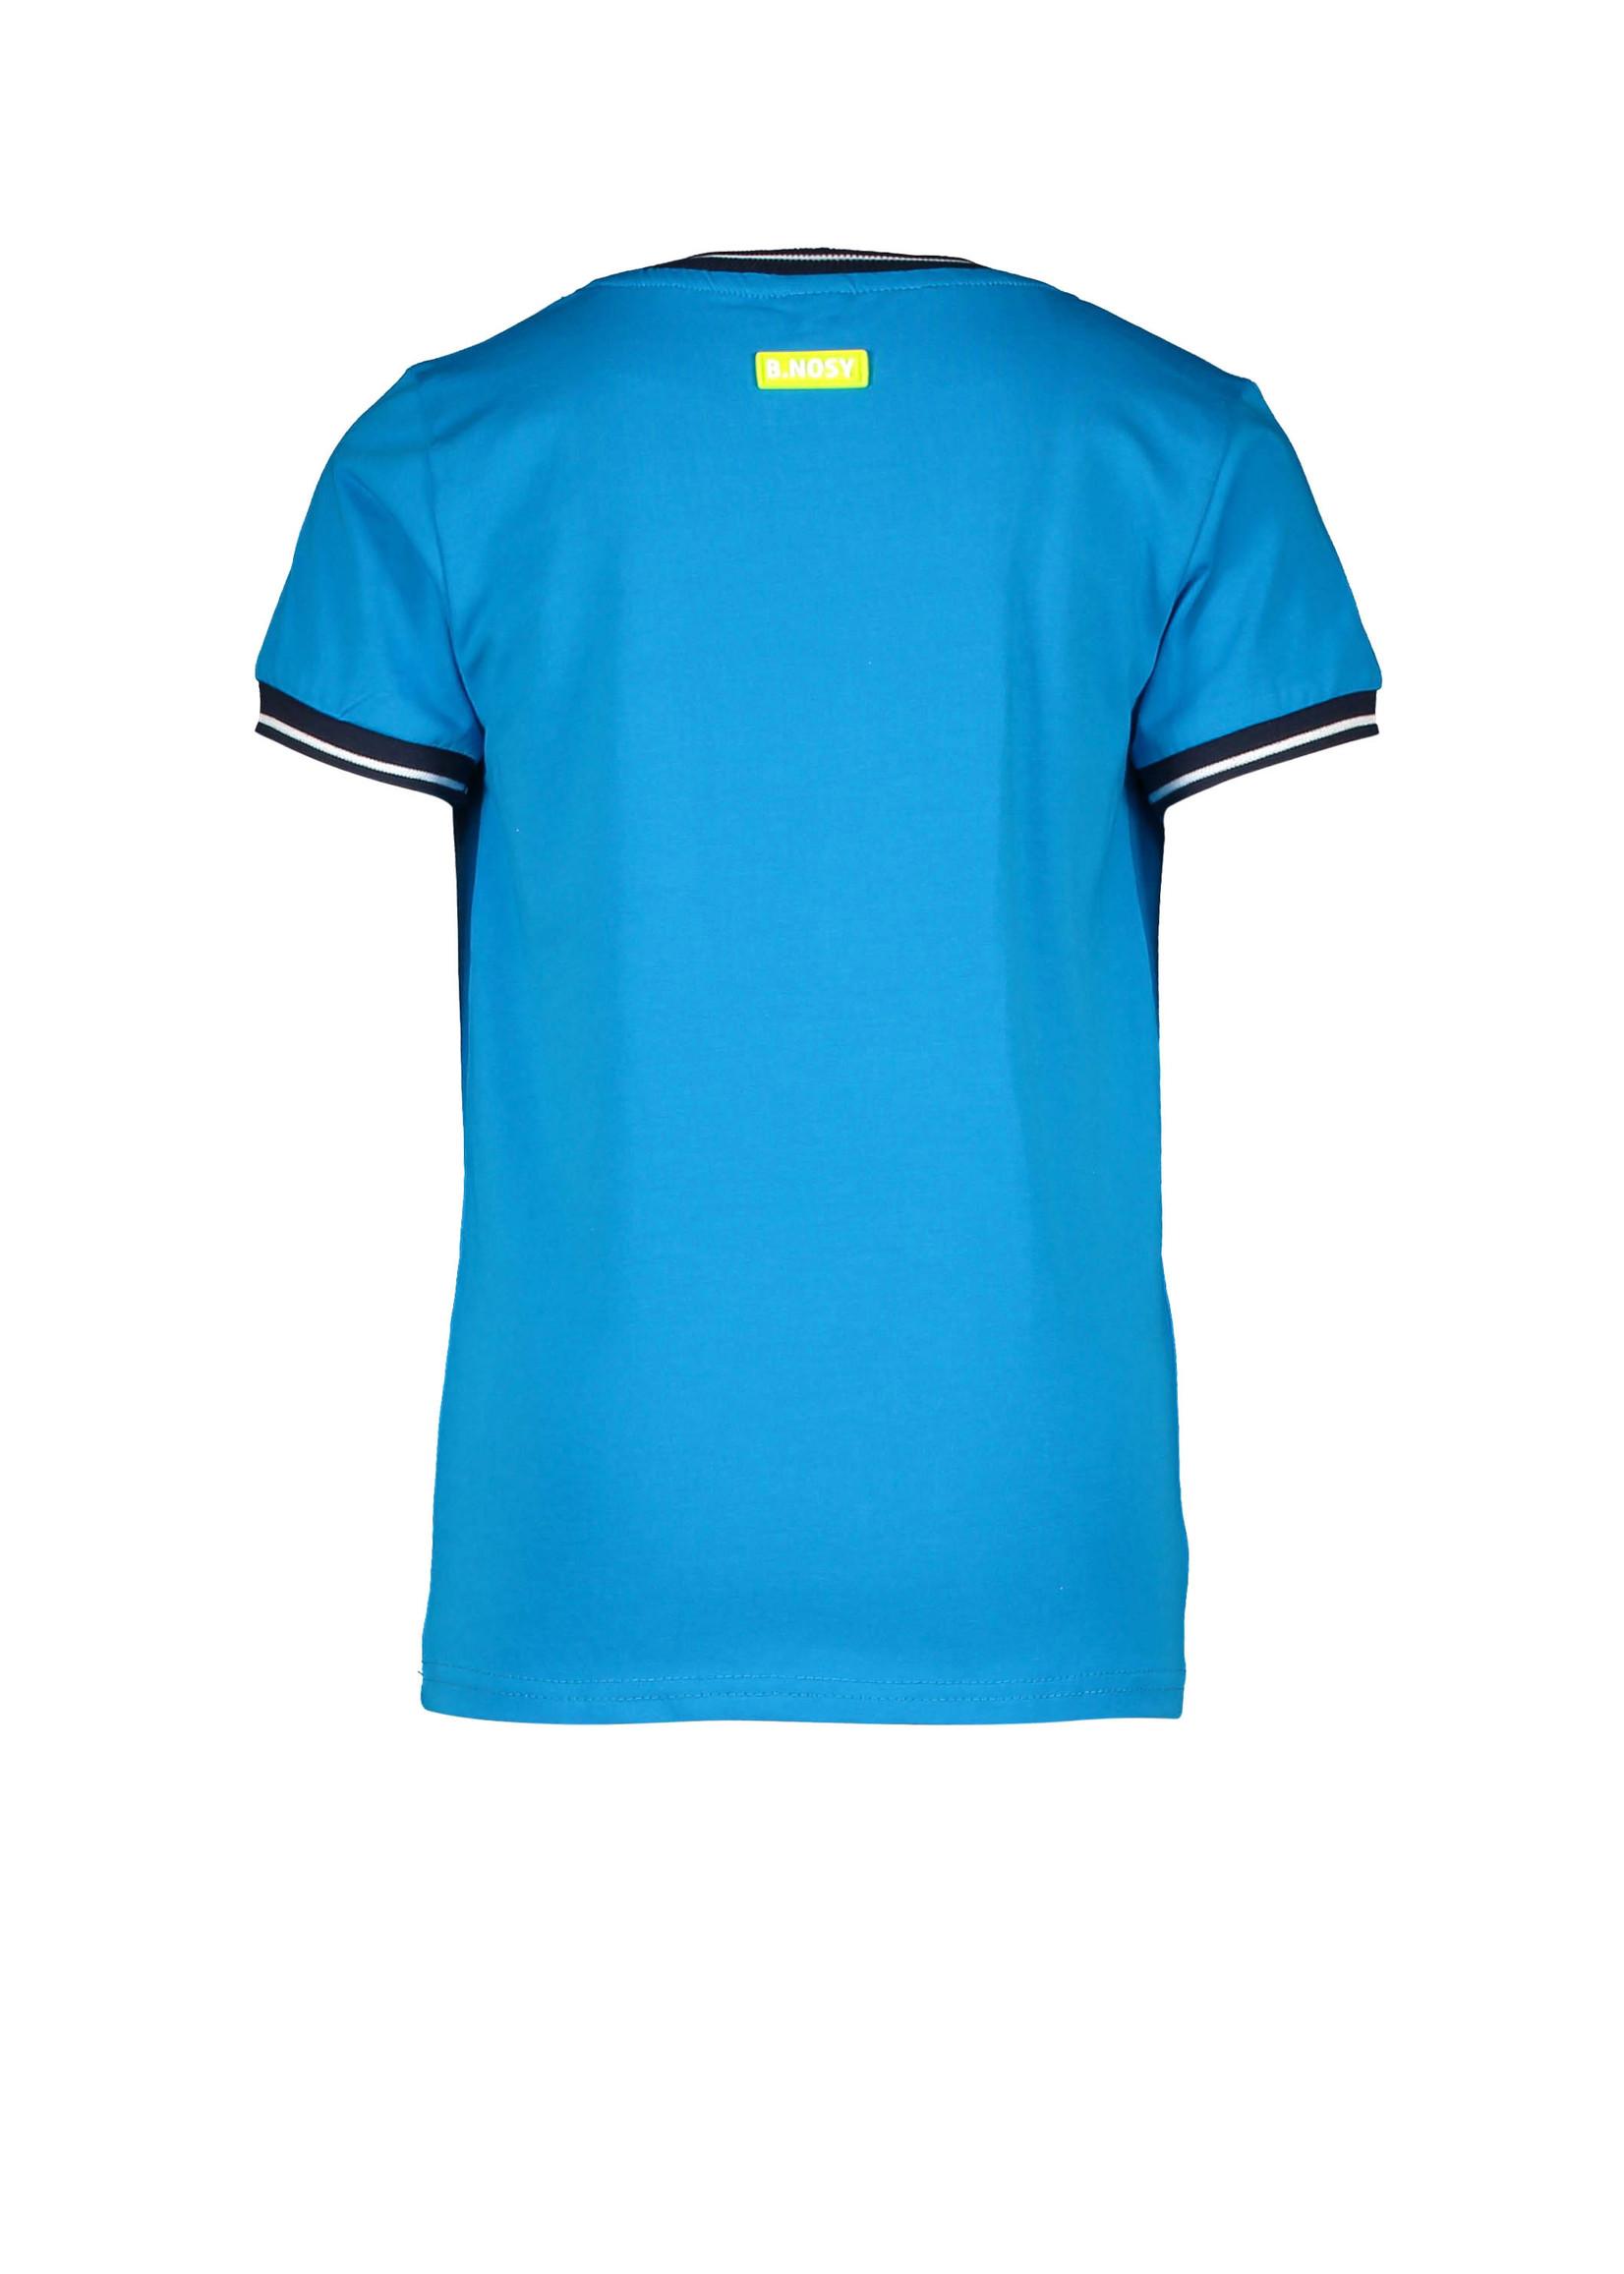 B.nosy Shirt Surf Blue